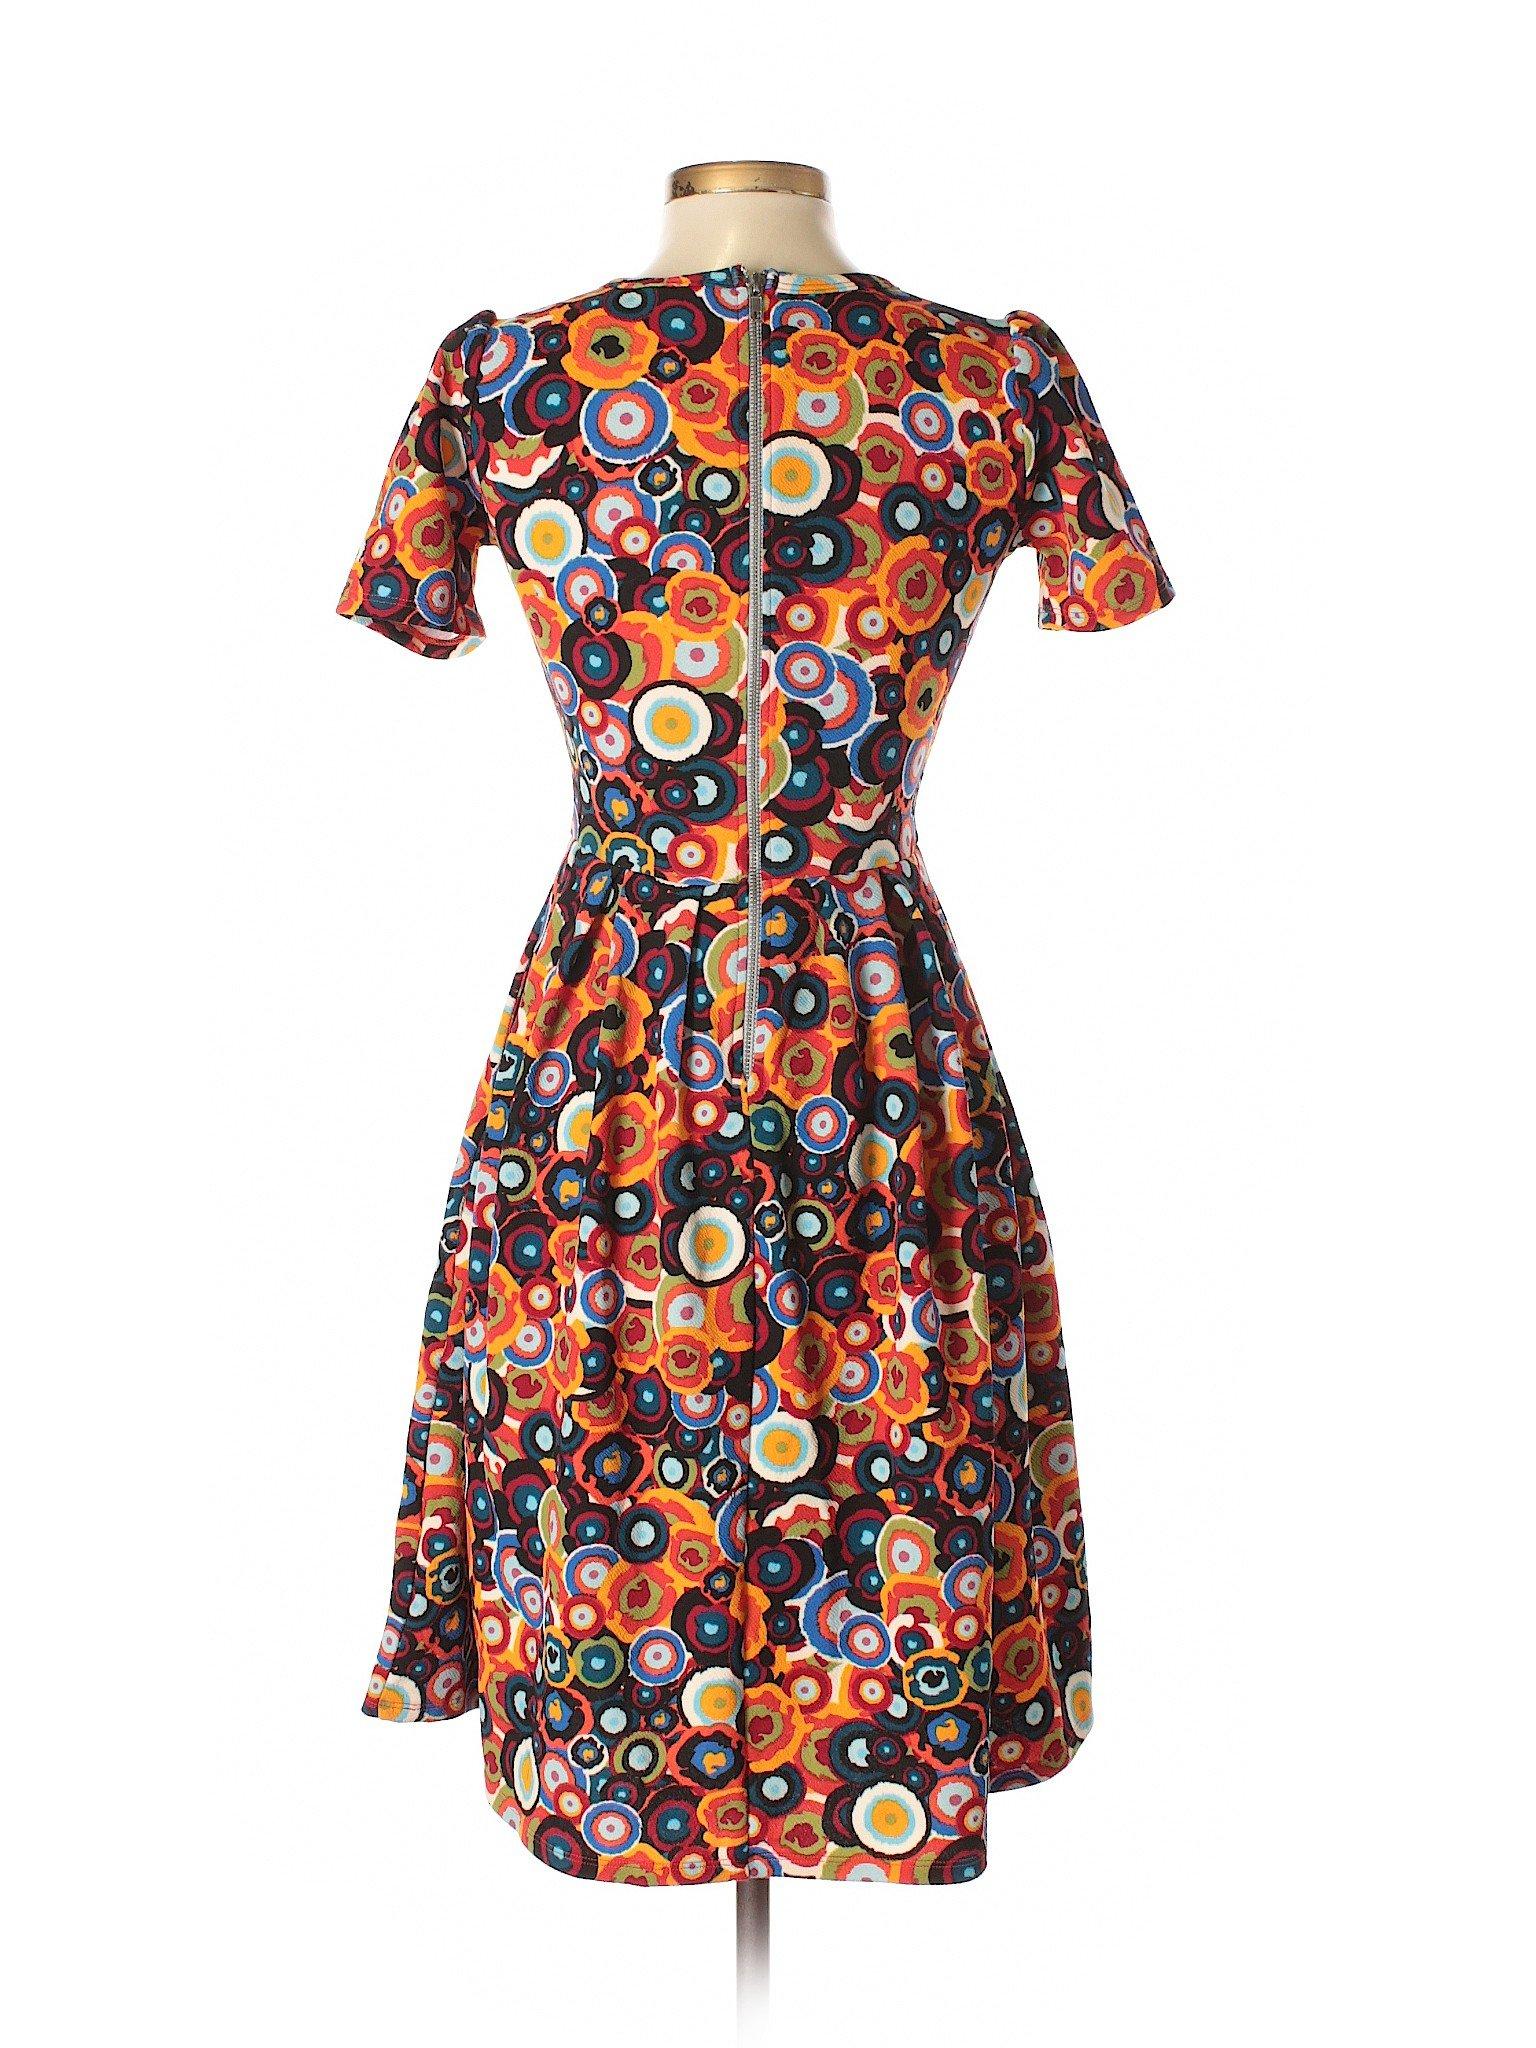 Boutique Dress winter Boutique Lularoe winter Casual zO4P0qwv